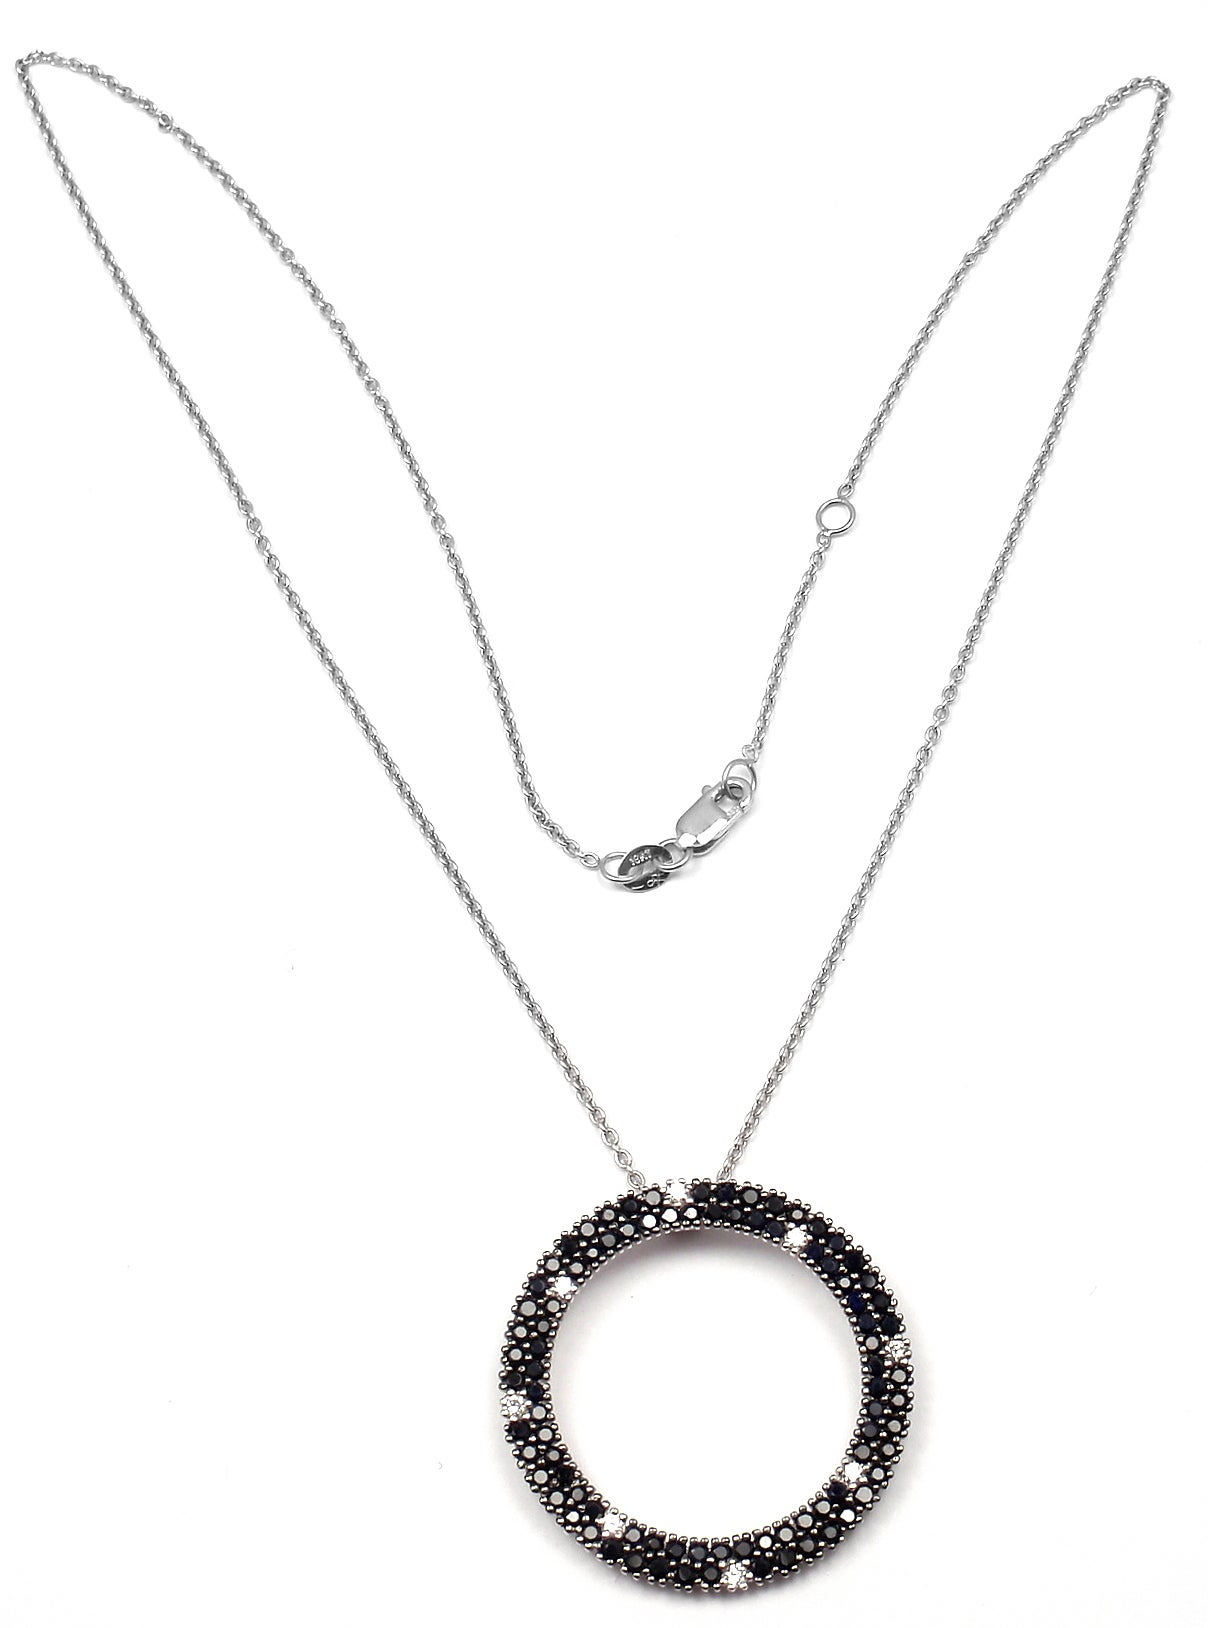 Roberto Coin Fantasia Black Sapphire Diamond Gold Pendant Necklace